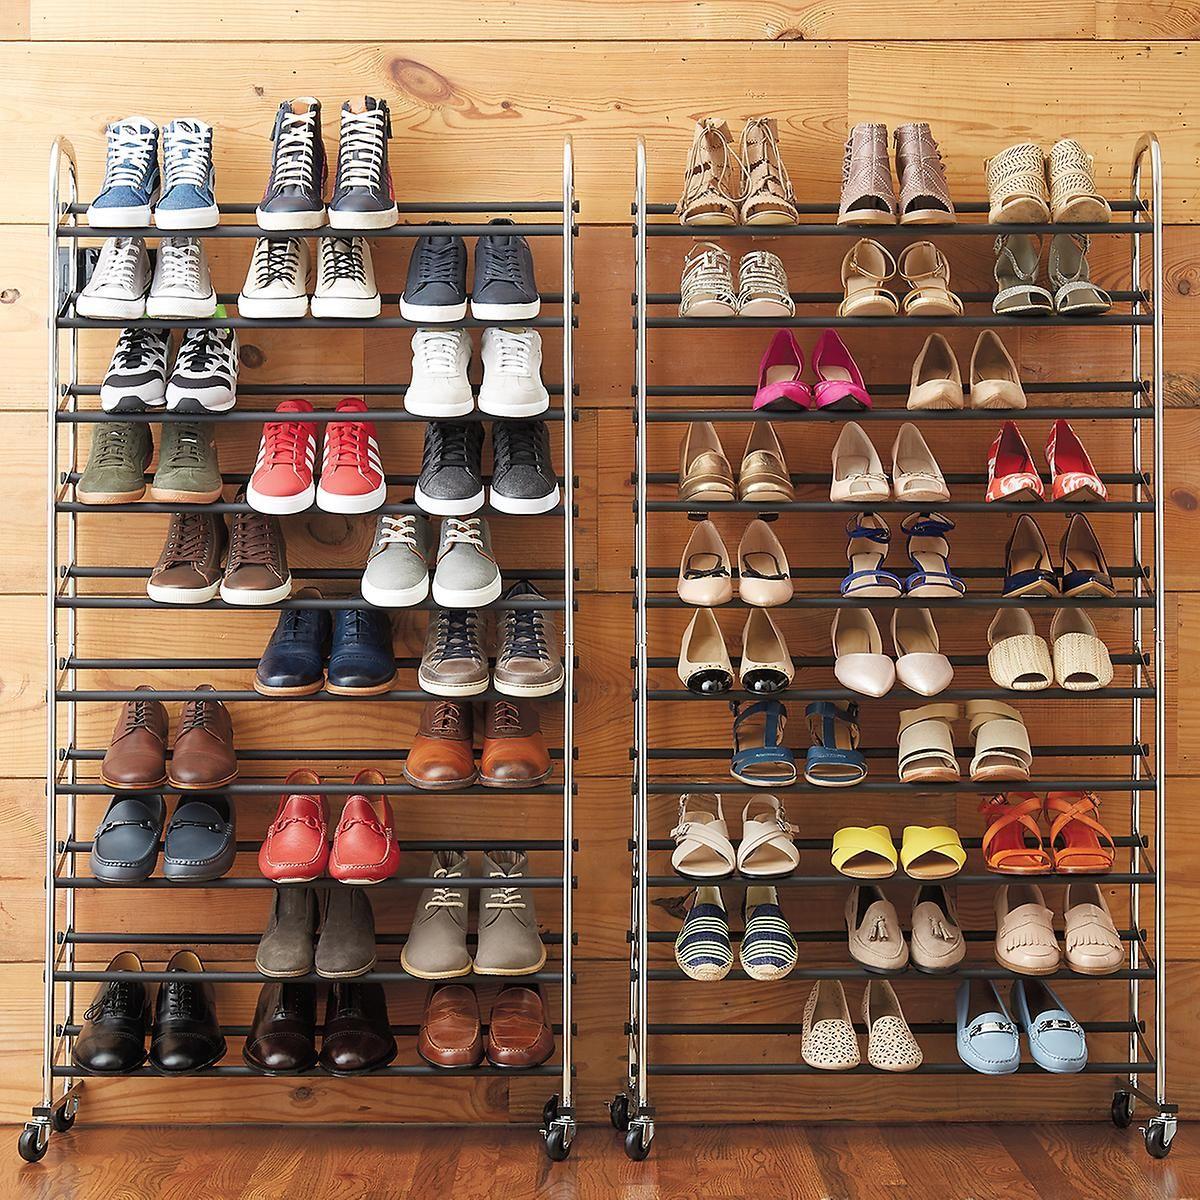 Chrome Metal 10 Tier Rolling Shoe Rack Shoe Storage Shoe Organizer Diy Shoe Rack